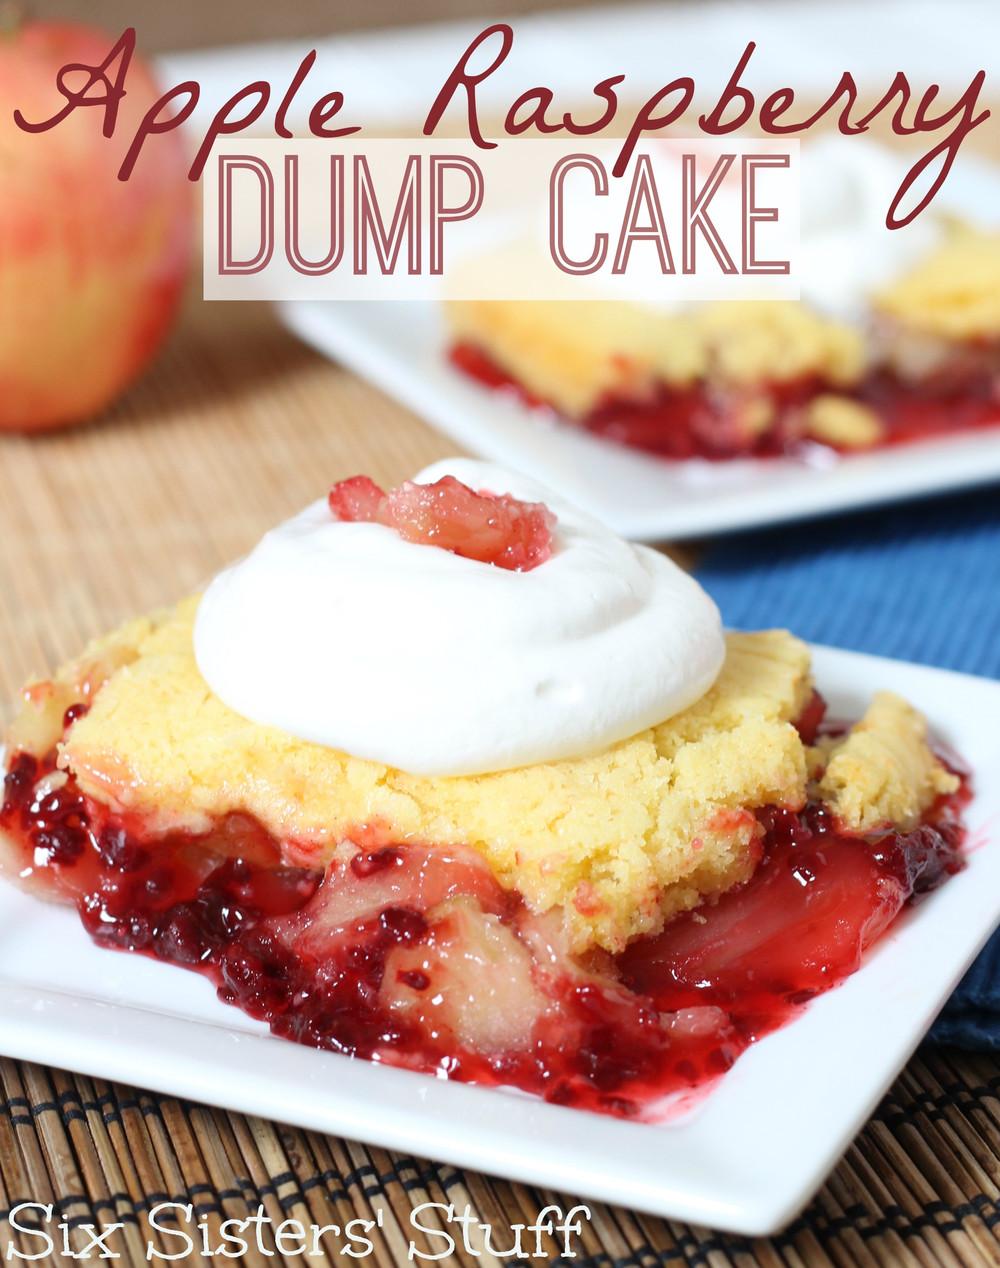 Amazing Apple Raspberry Dump Cake | TheBestDessertRecipes.com